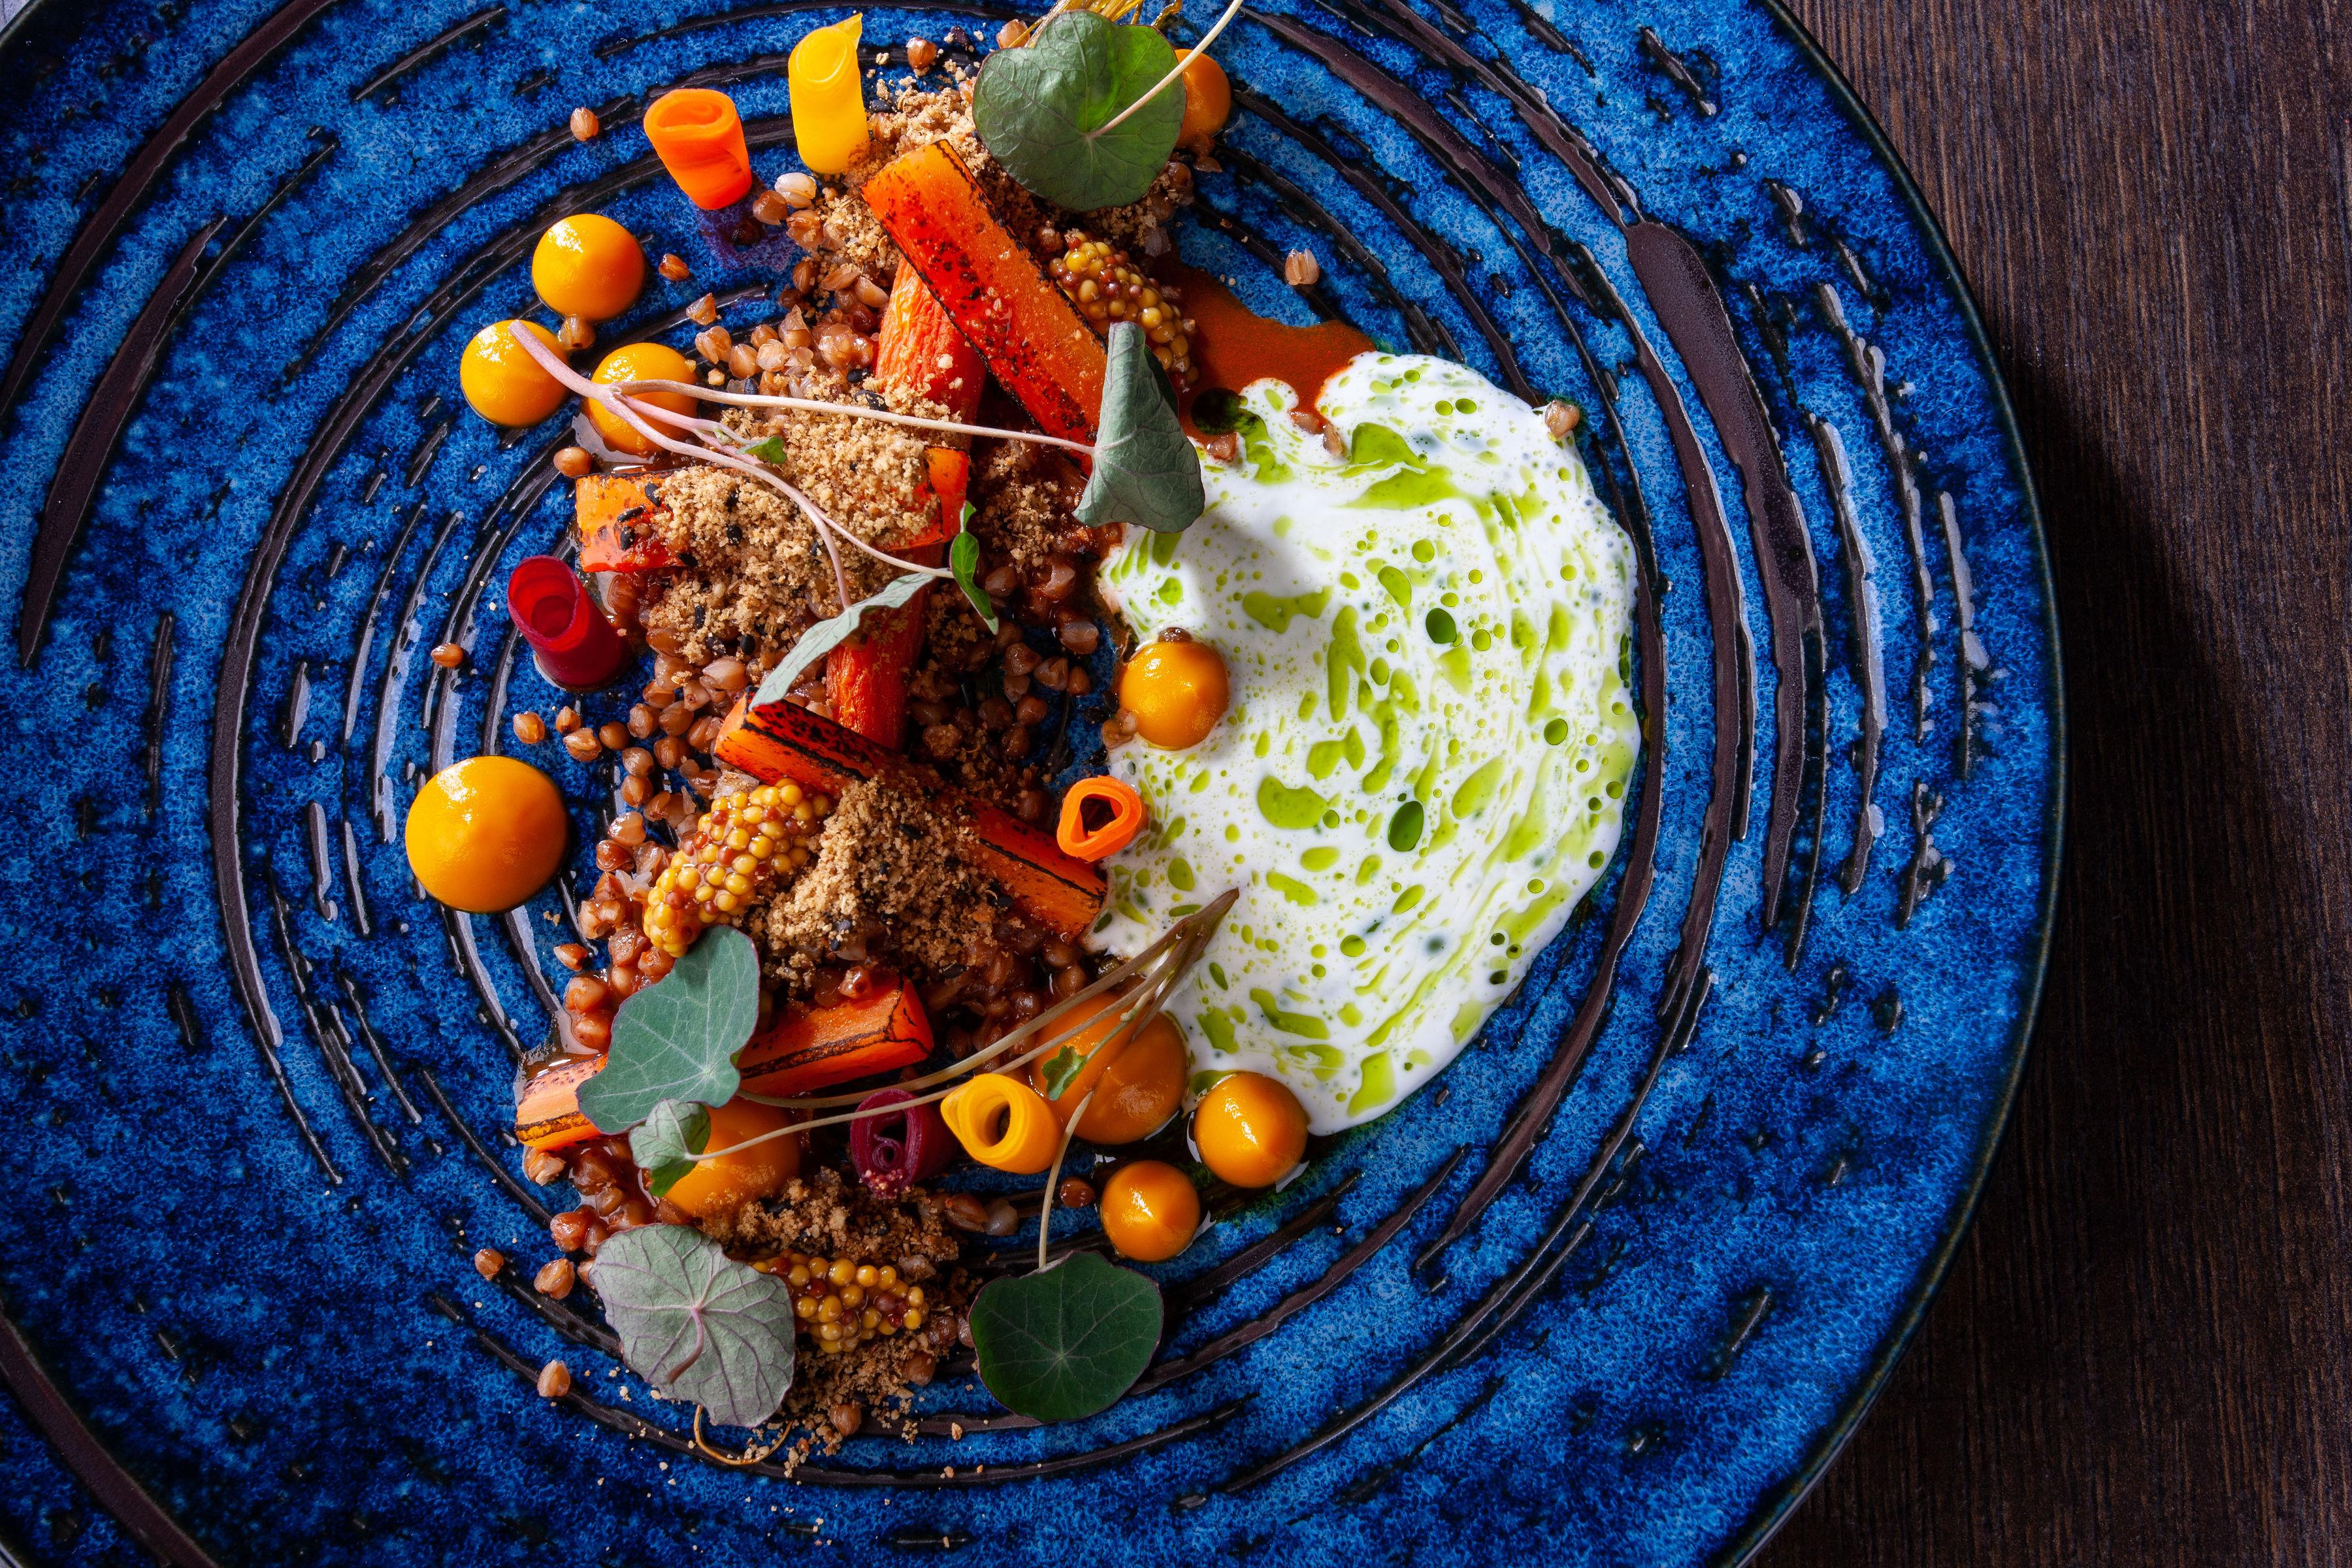 TOP 15 foodstyling photos from MIJ Instagram - AUGUST!